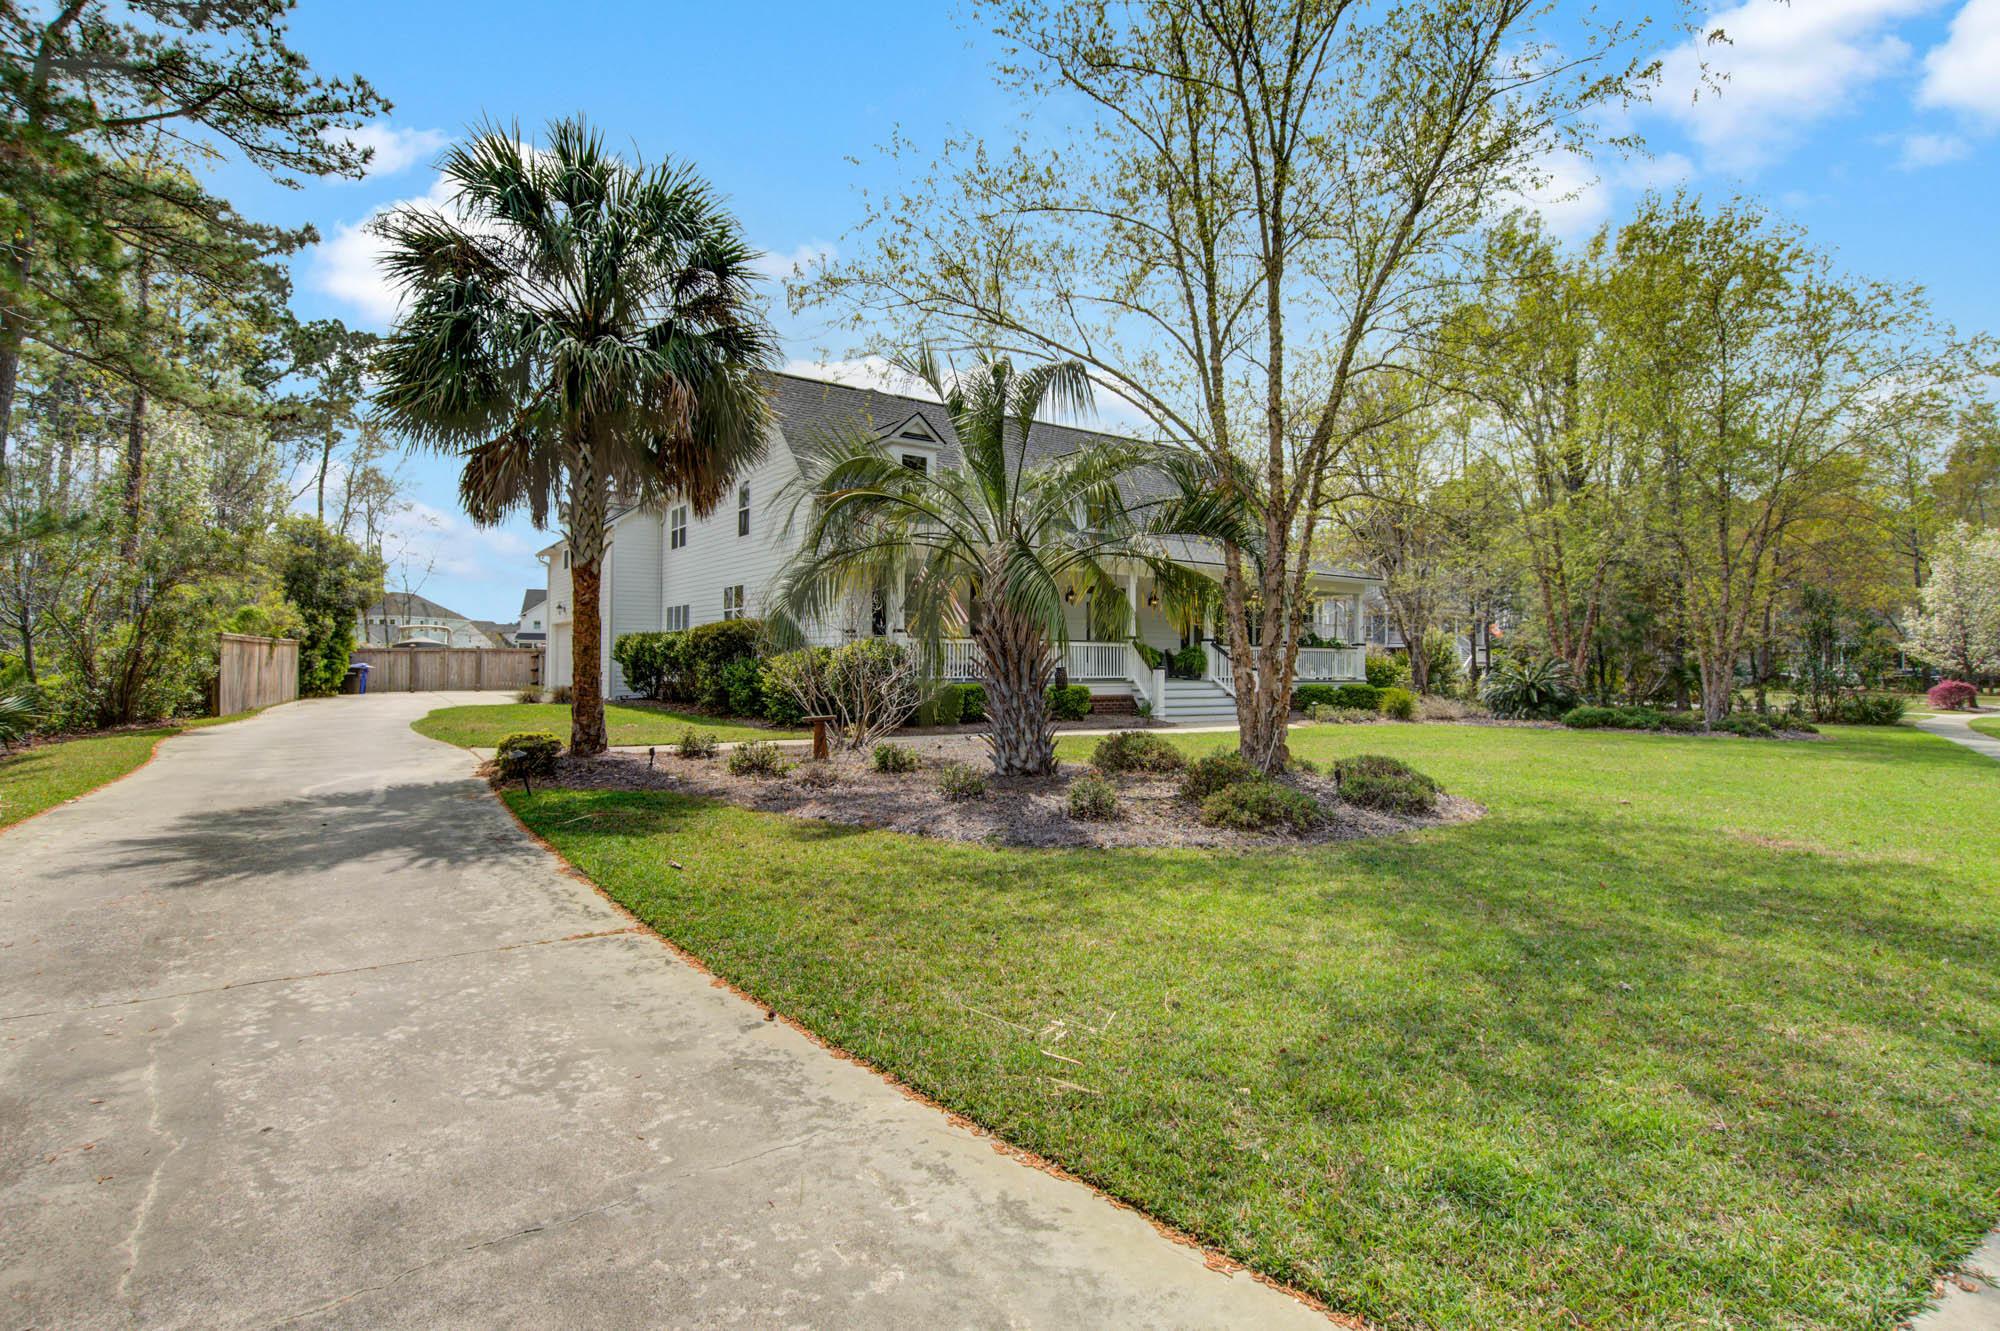 Darrell Creek Homes For Sale - 3783 Saint Ellens, Mount Pleasant, SC - 44